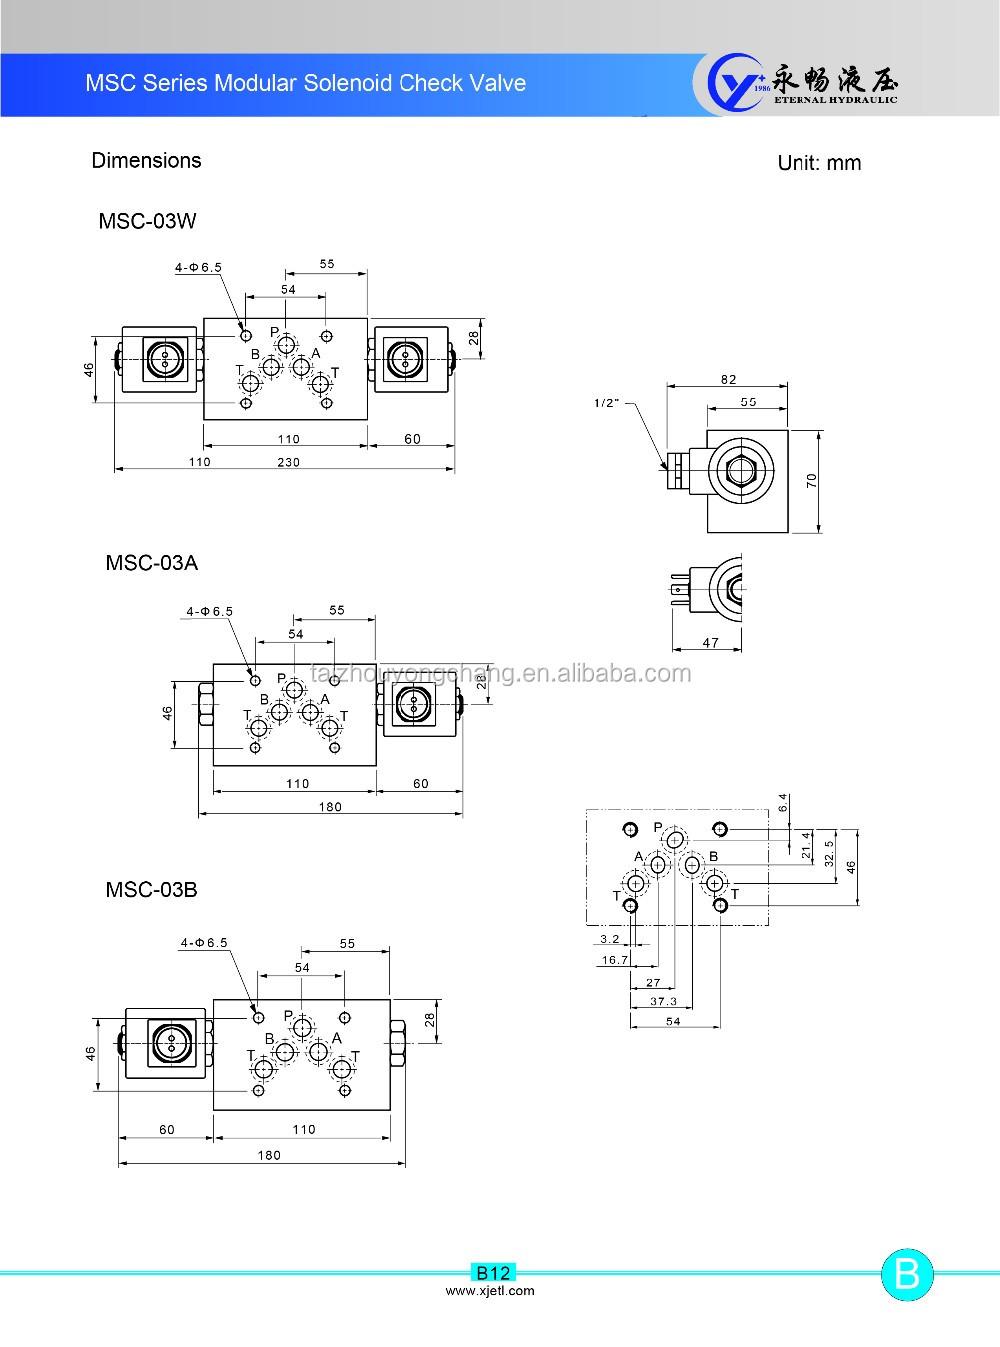 Price of msc 03w modular type harga solenoid variable flow control price of msc 03w modular type harga solenoid variable flow control valve check valve symbol biocorpaavc